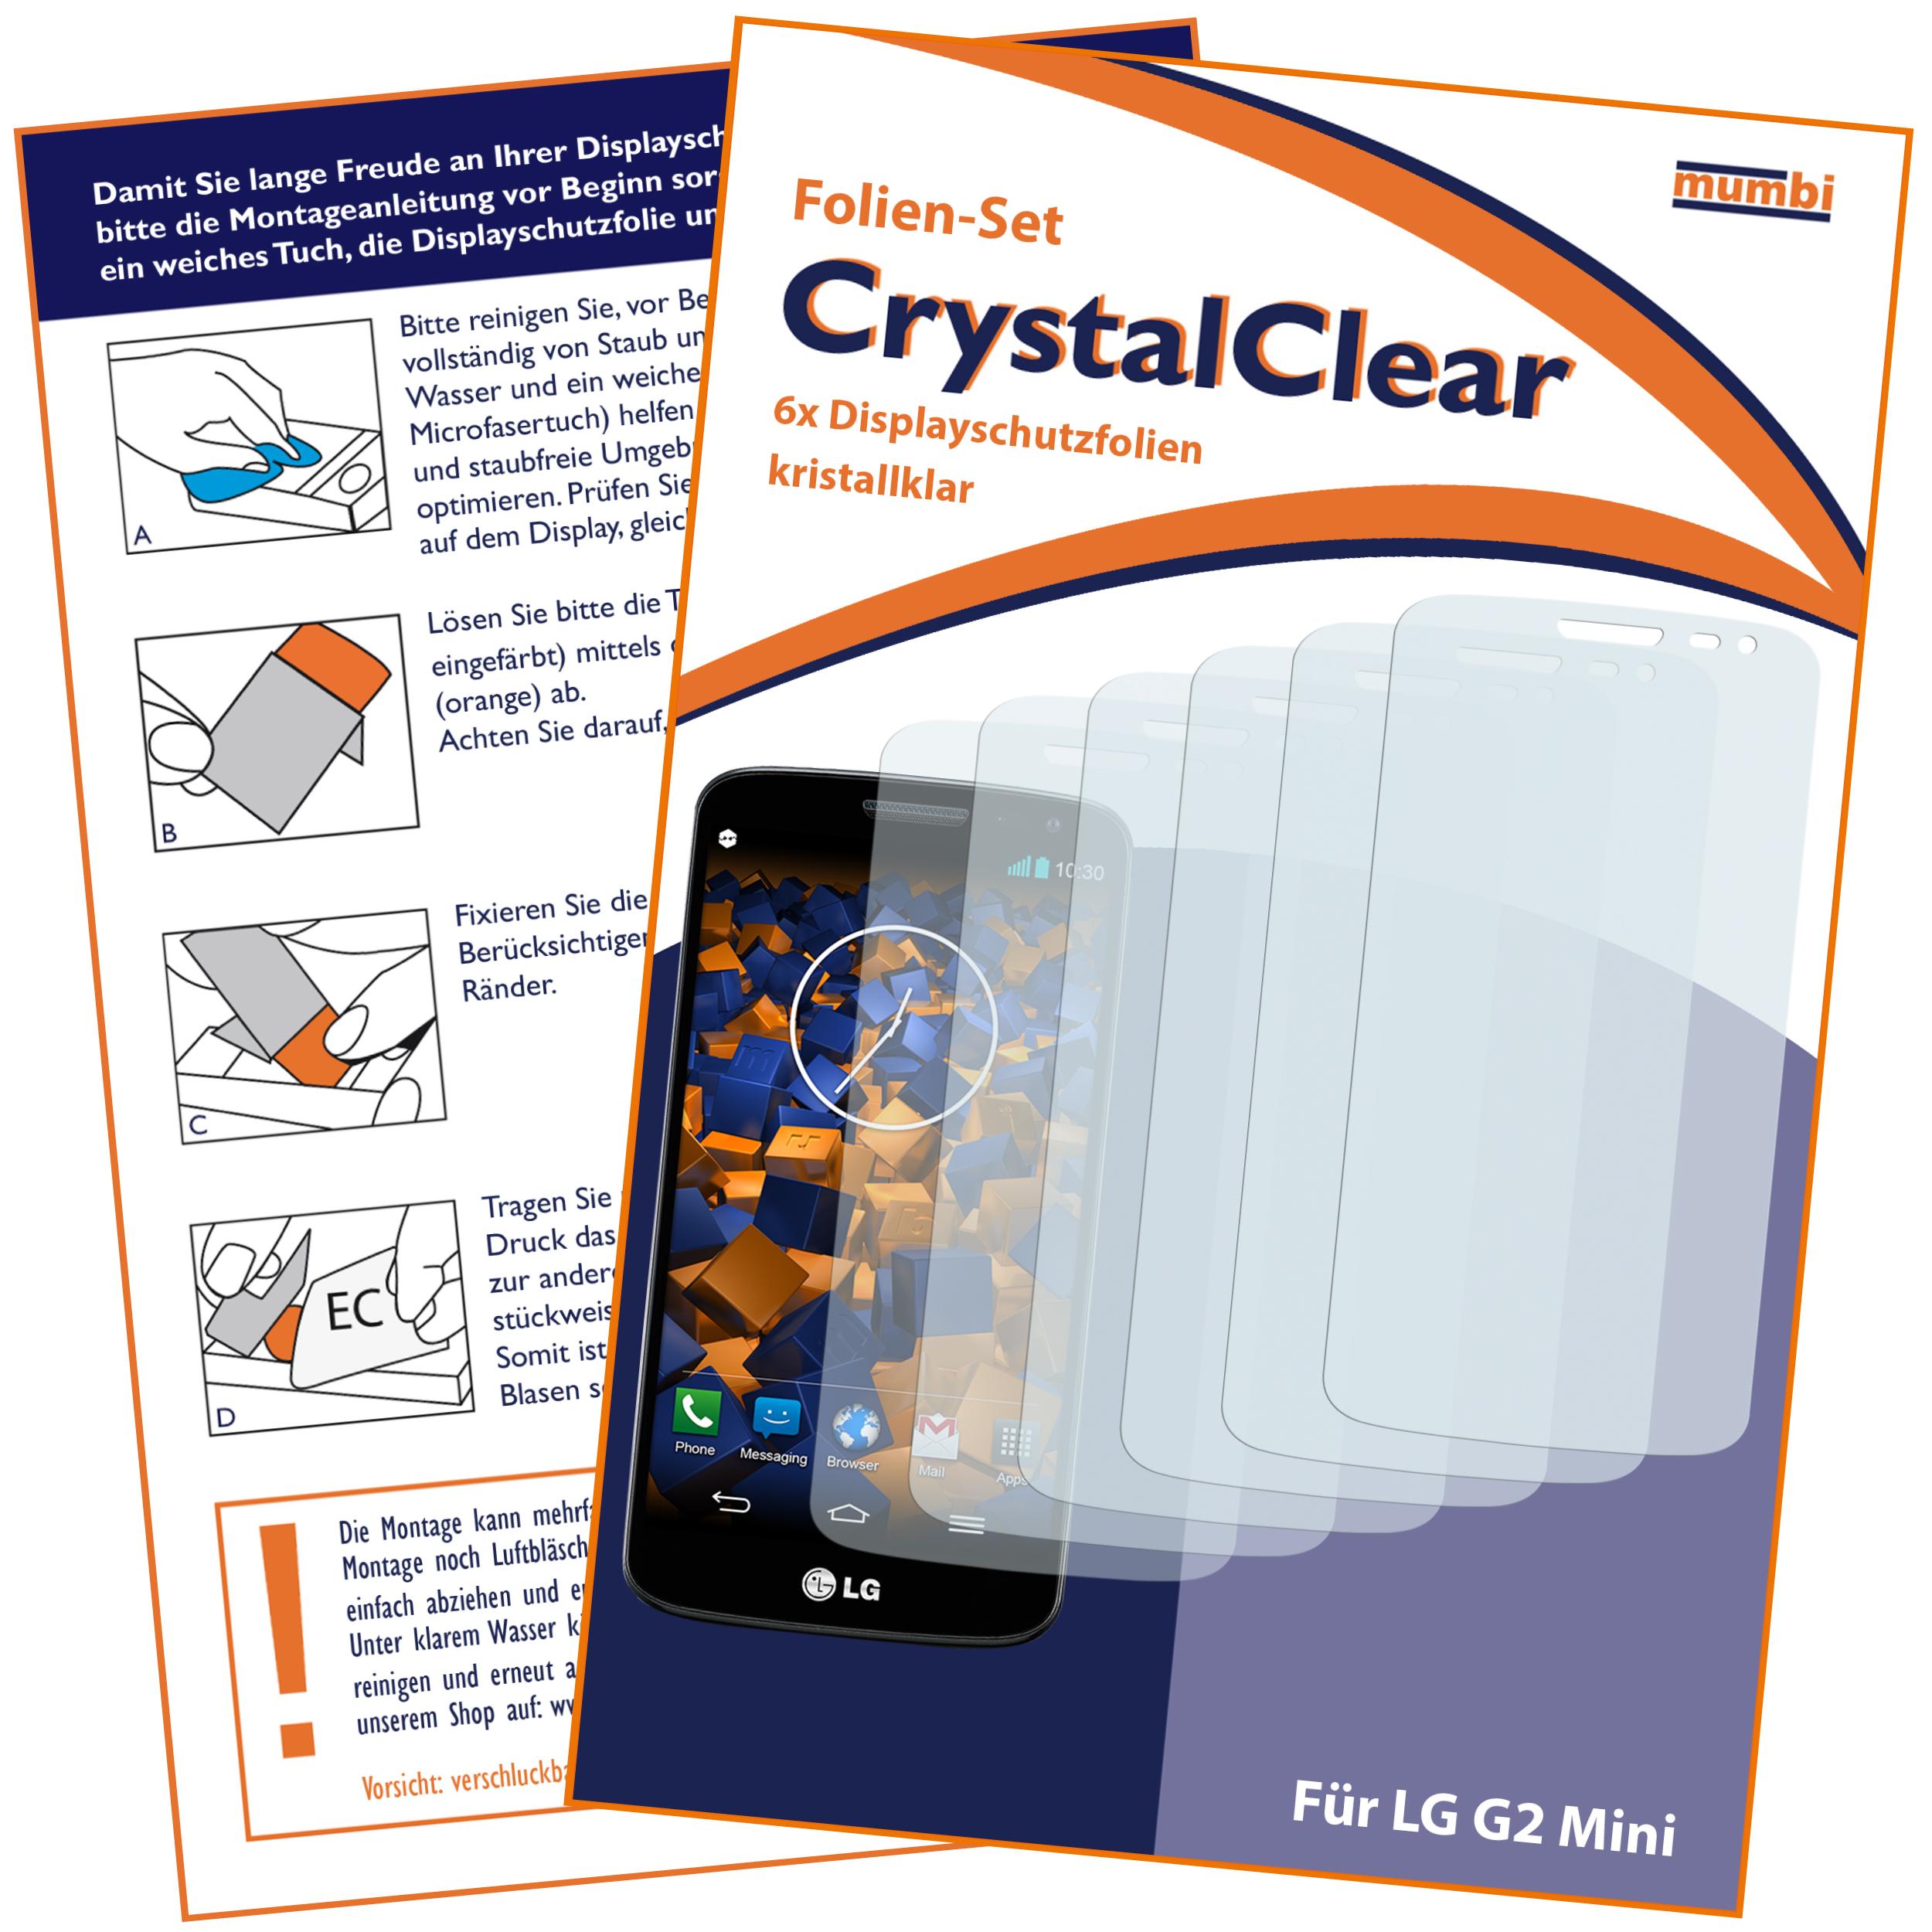 Displayschutzfolie 6 Stck. CrystalClear für LG G2 Mini | LG ...